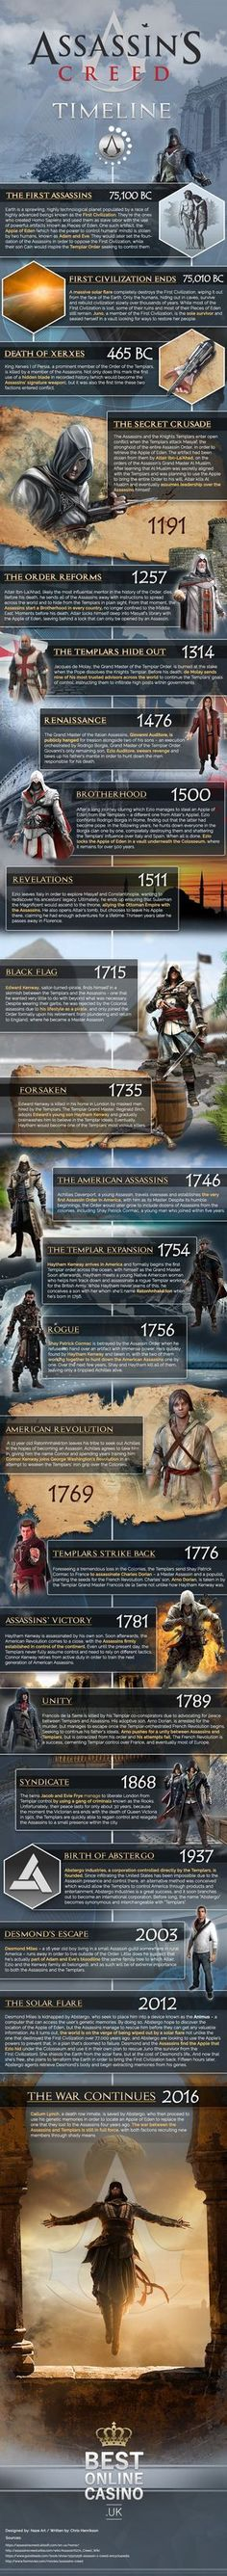 assassins creed history